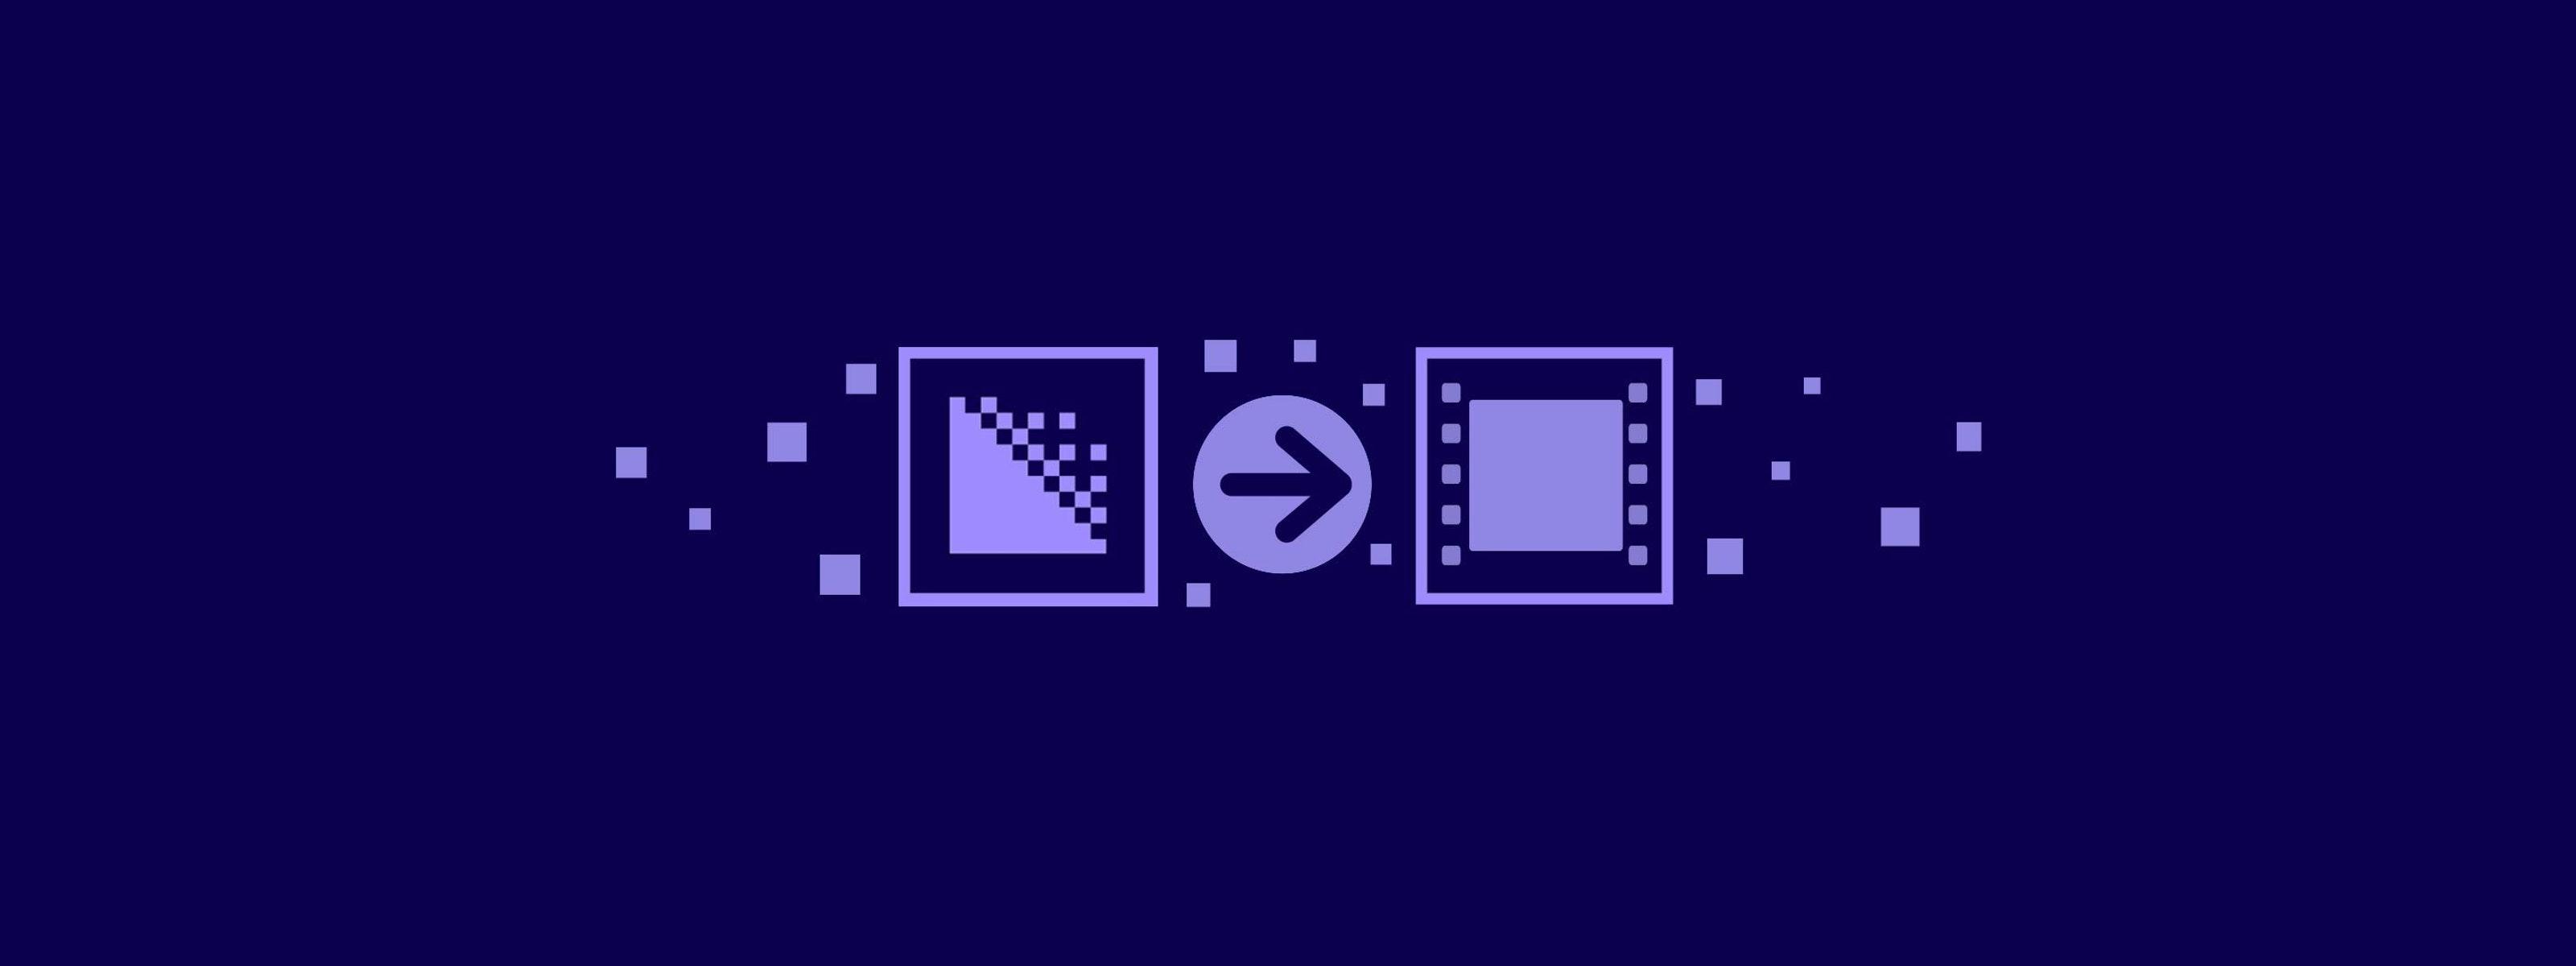 adobe media encoder presets download